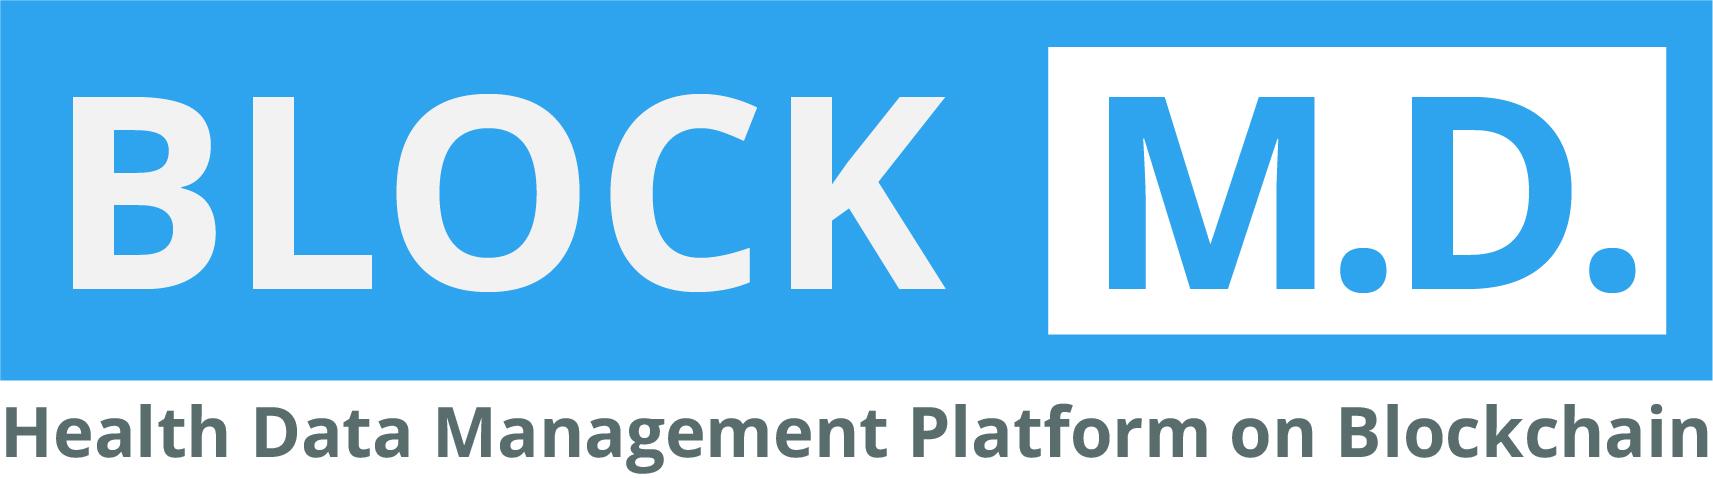 BLOCK M.D. logo